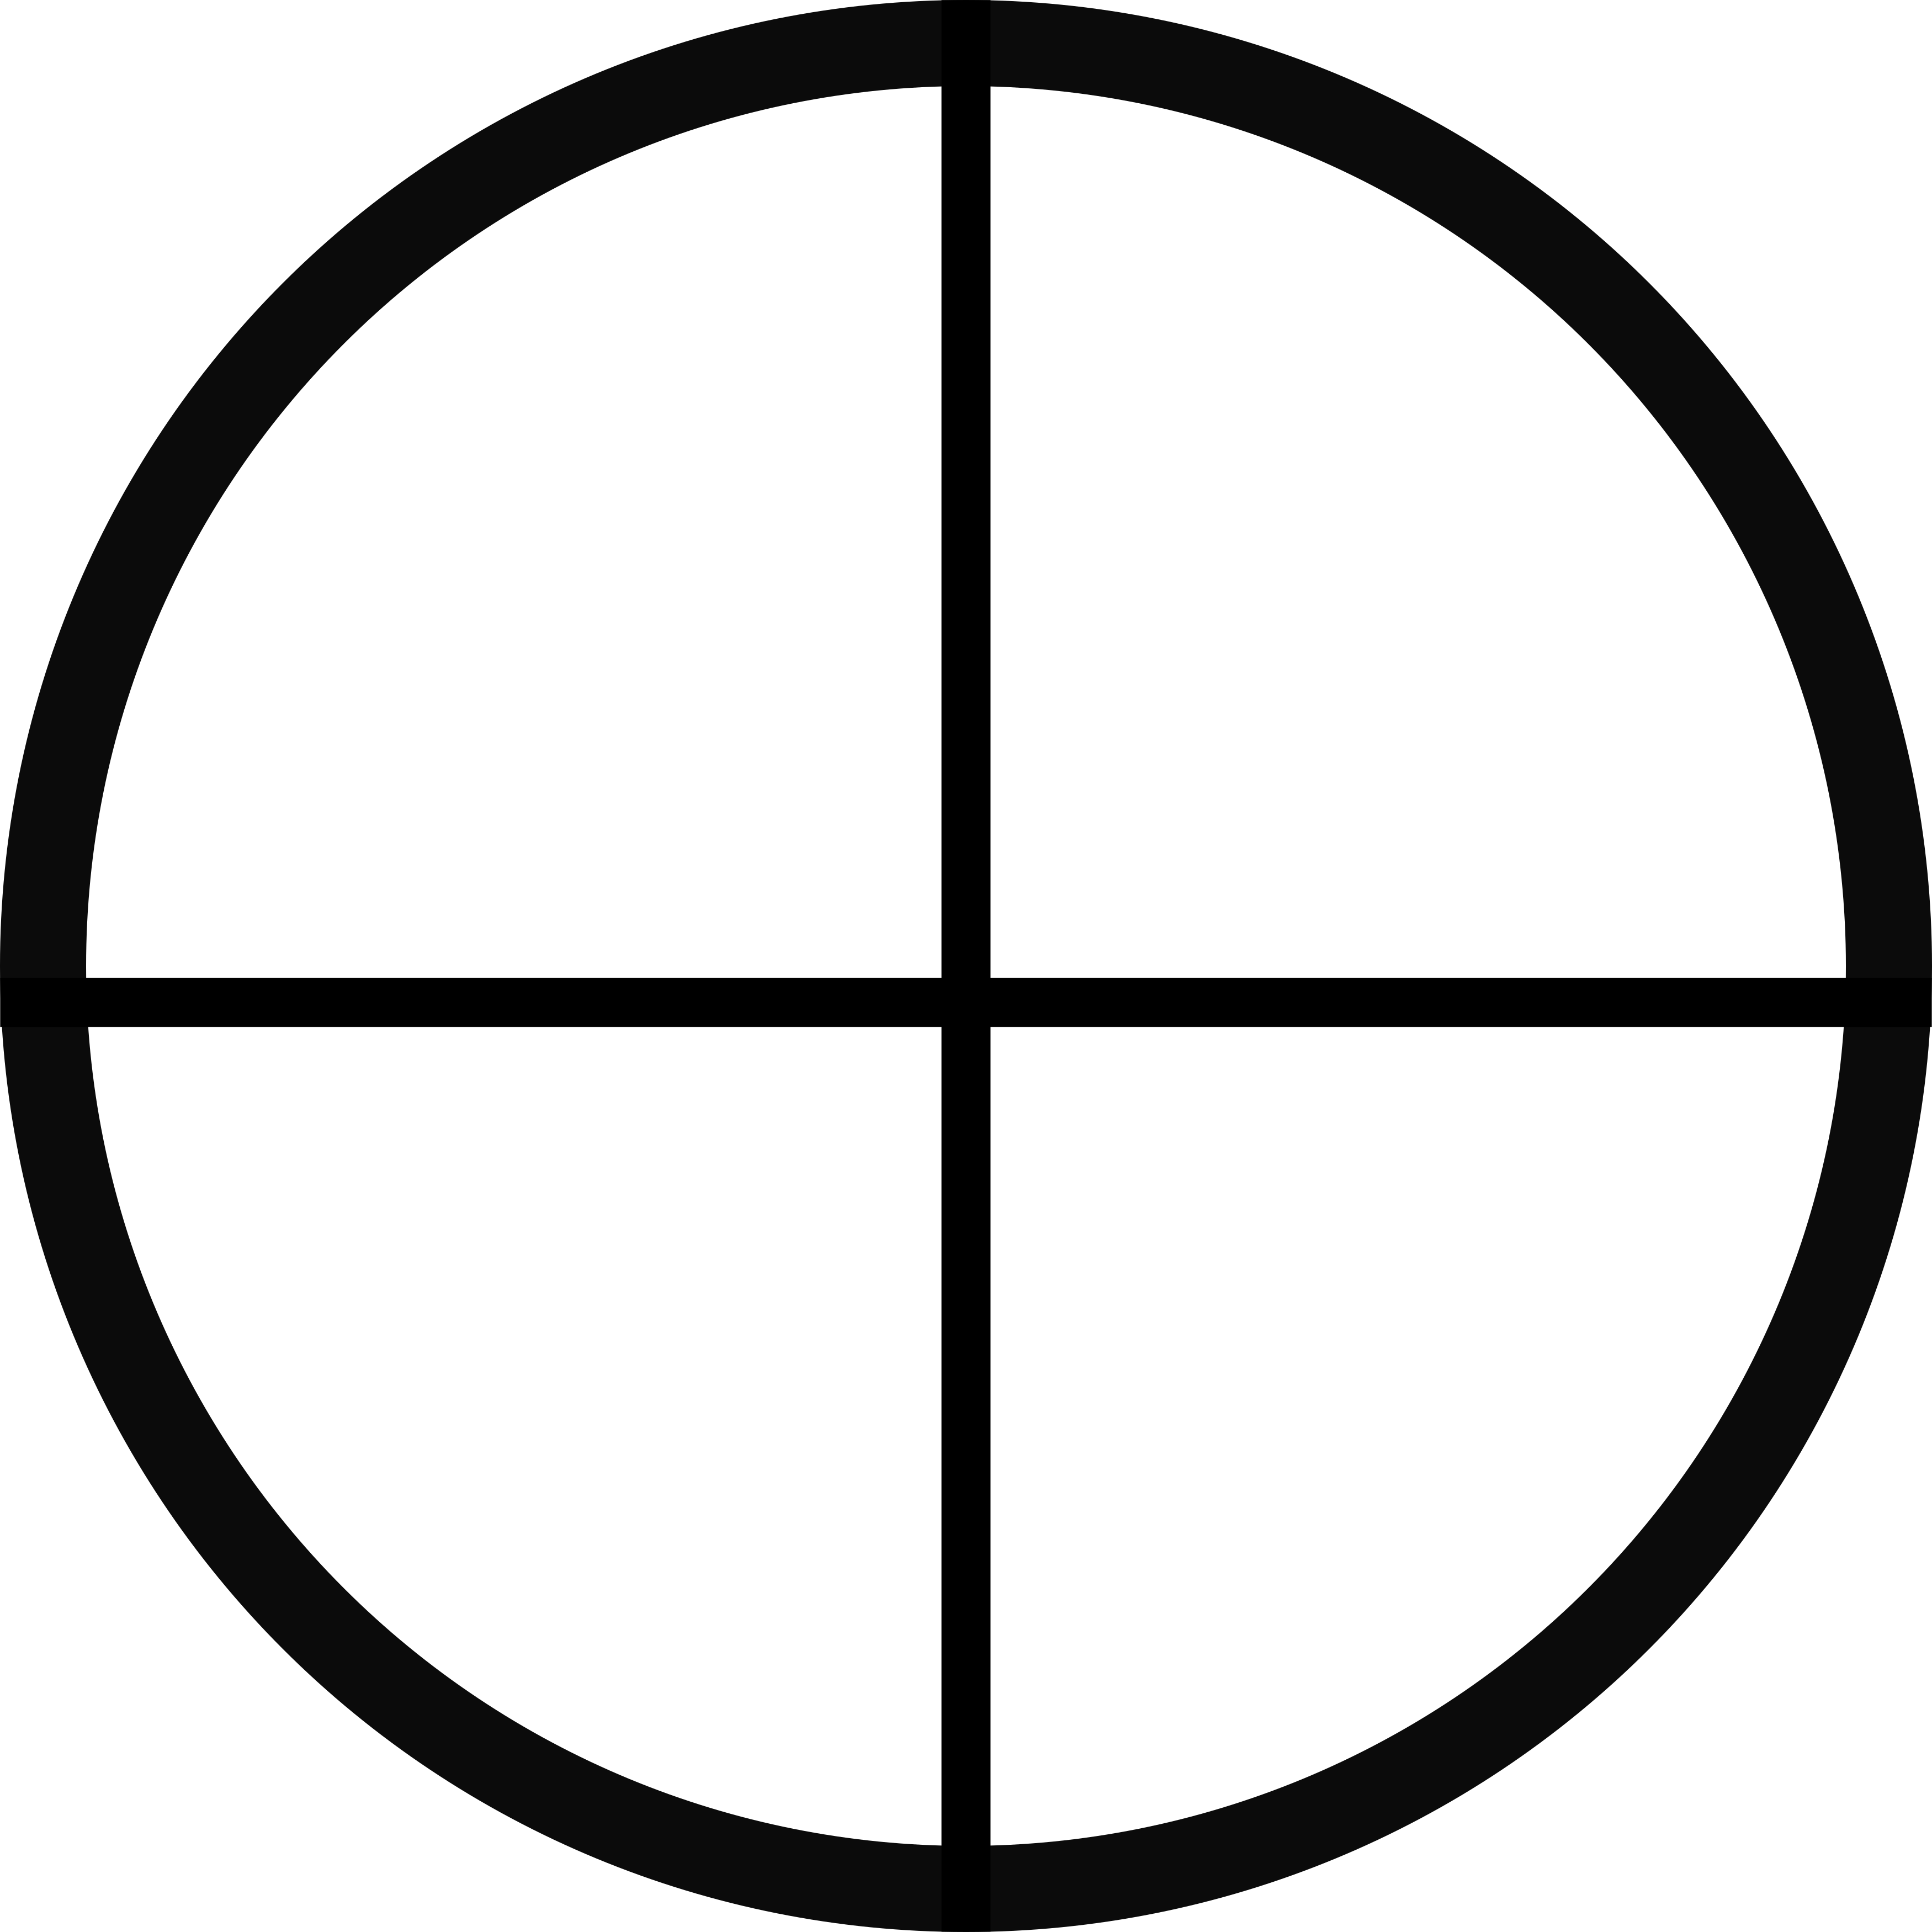 um-quarto-matematica-1